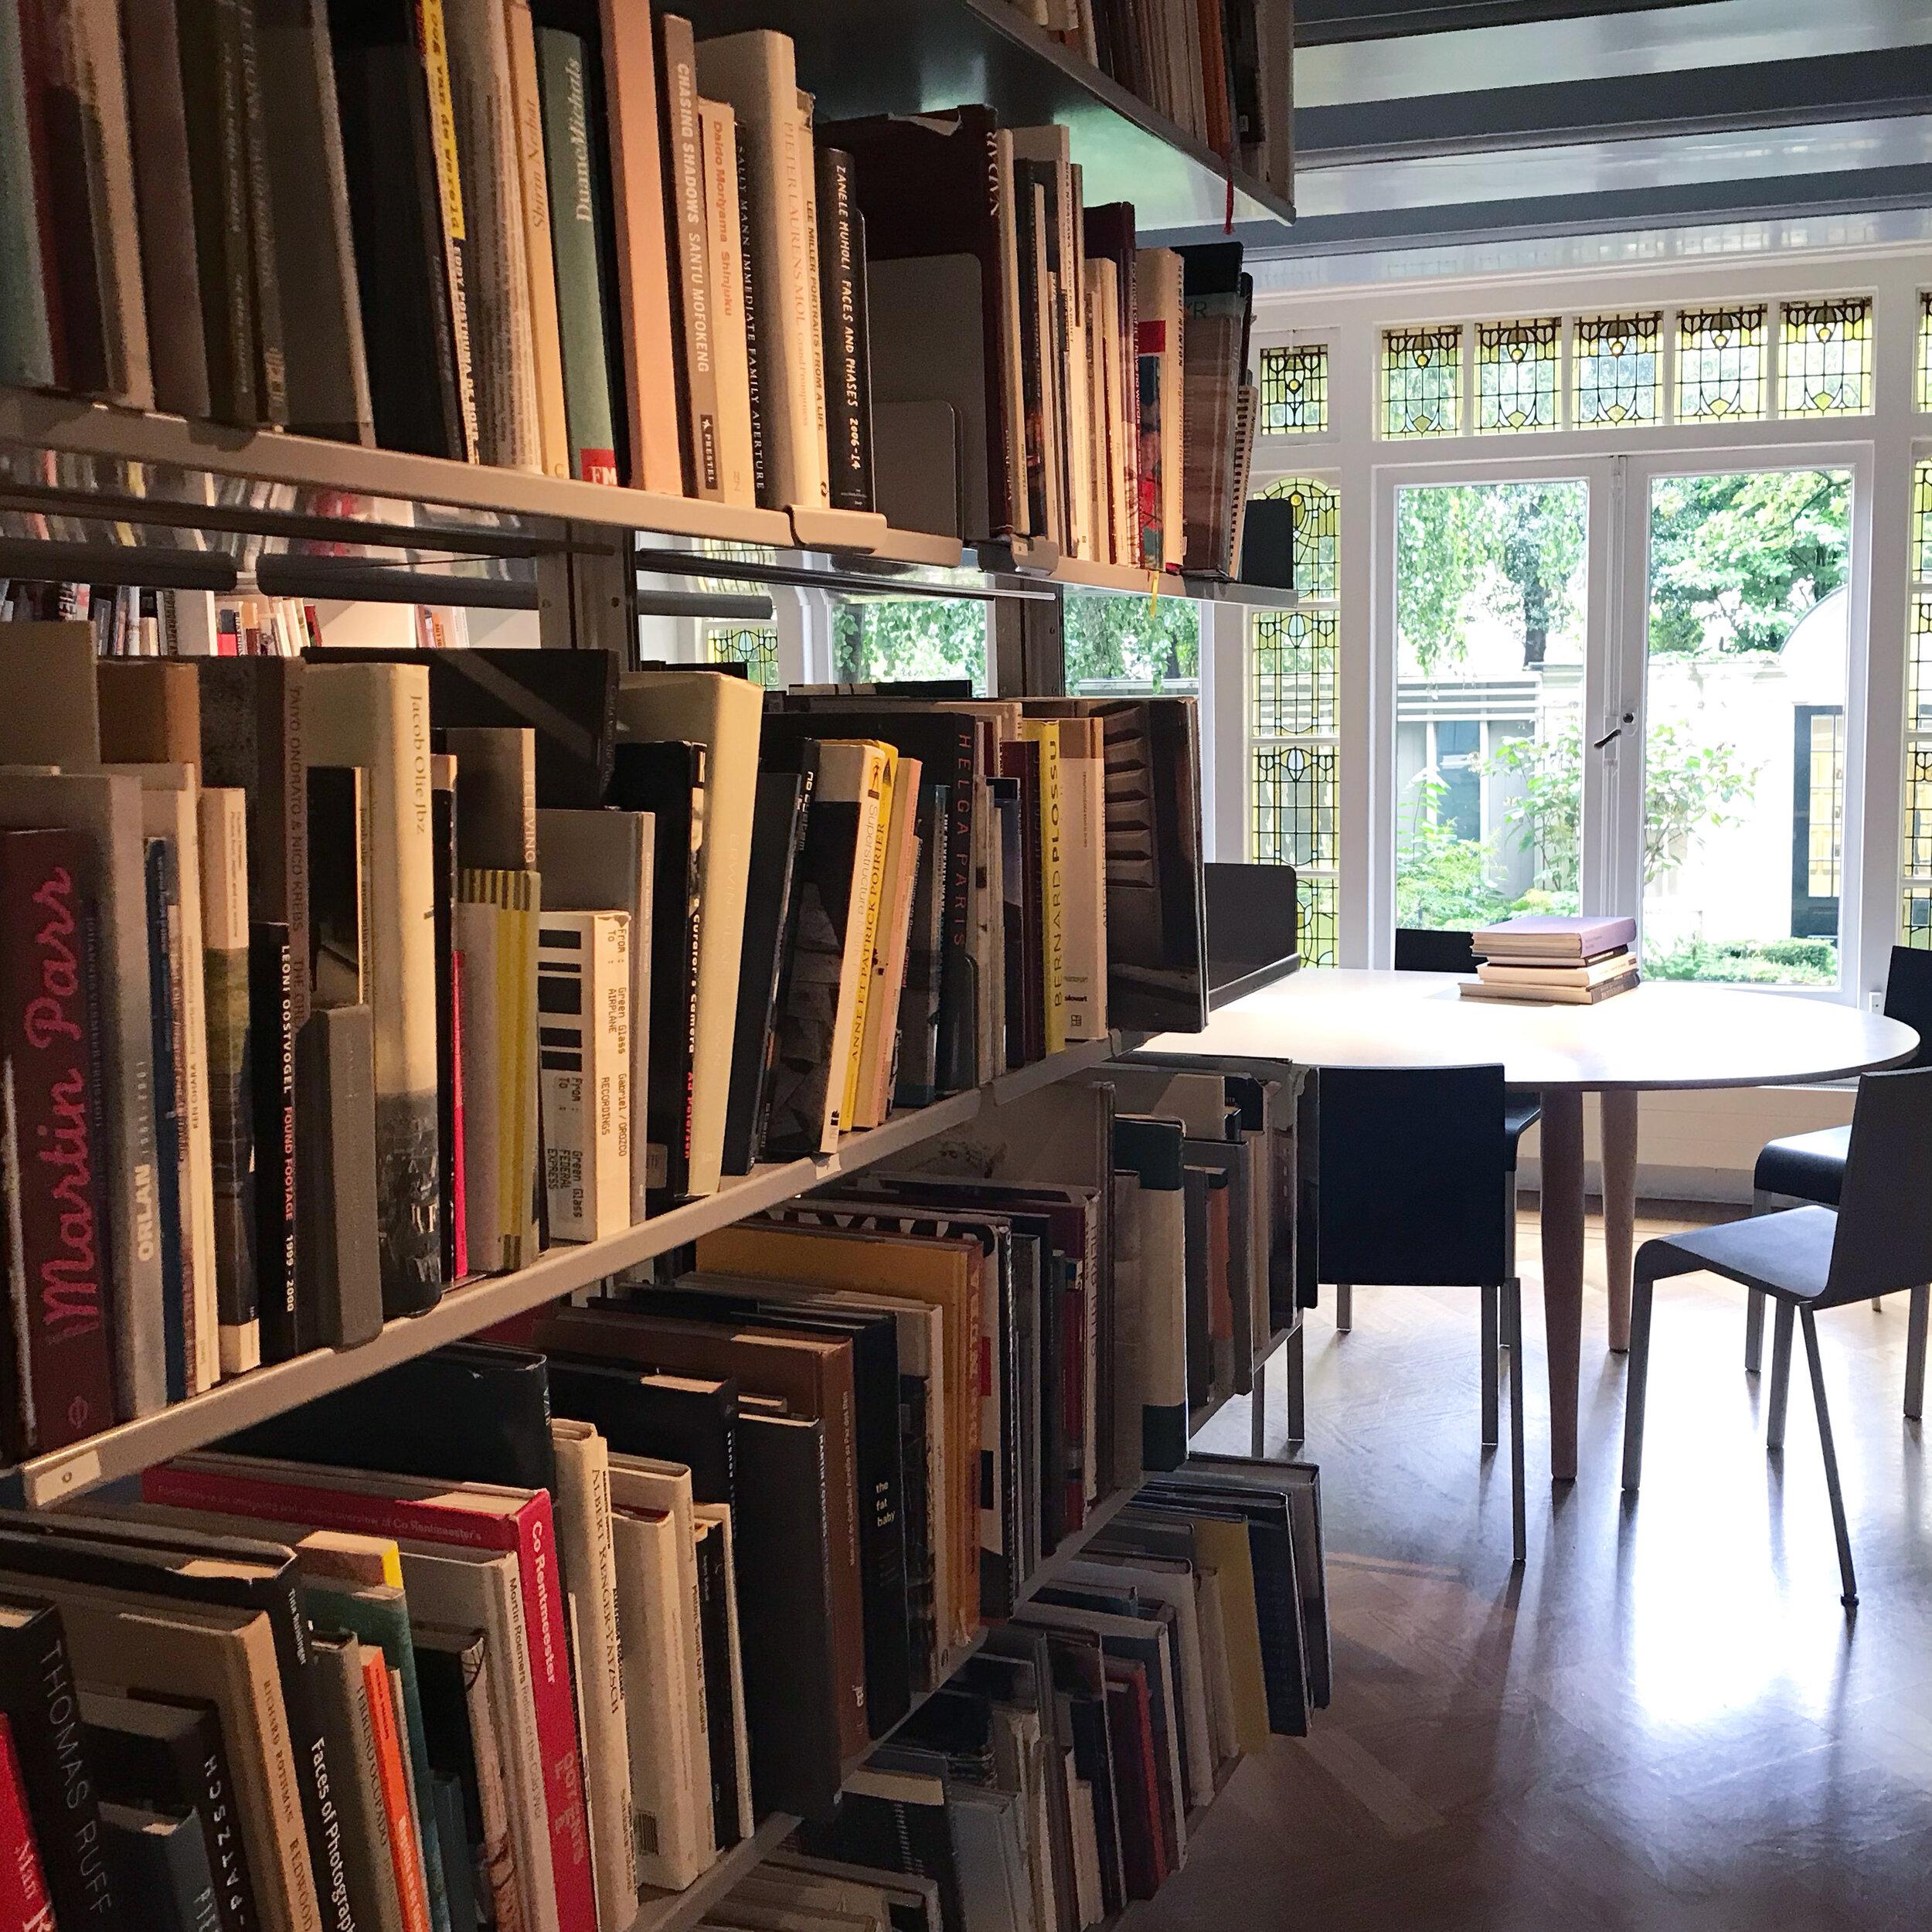 Huis Marseille  Reading Room